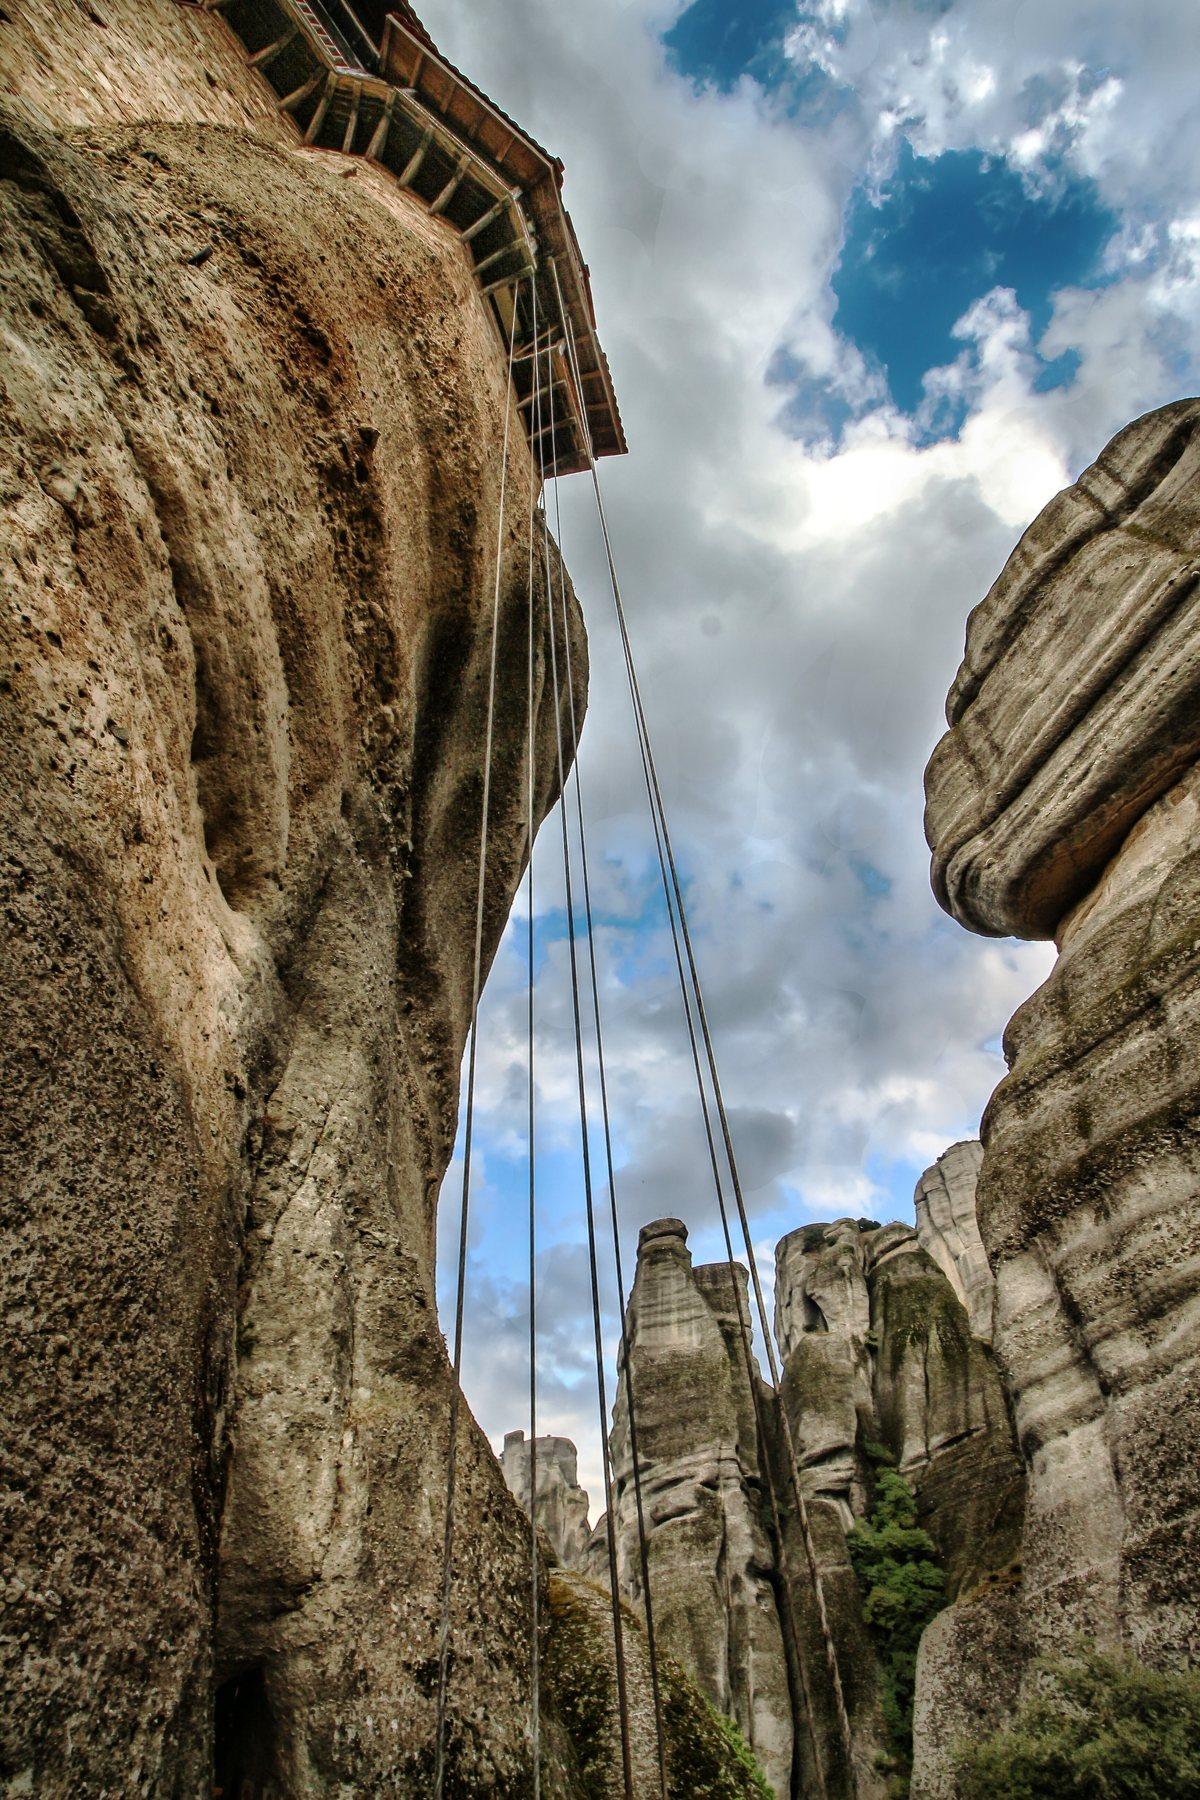 greece, travel, meteora, tourism, monasteries, rocks,, Bistra Stoimenova